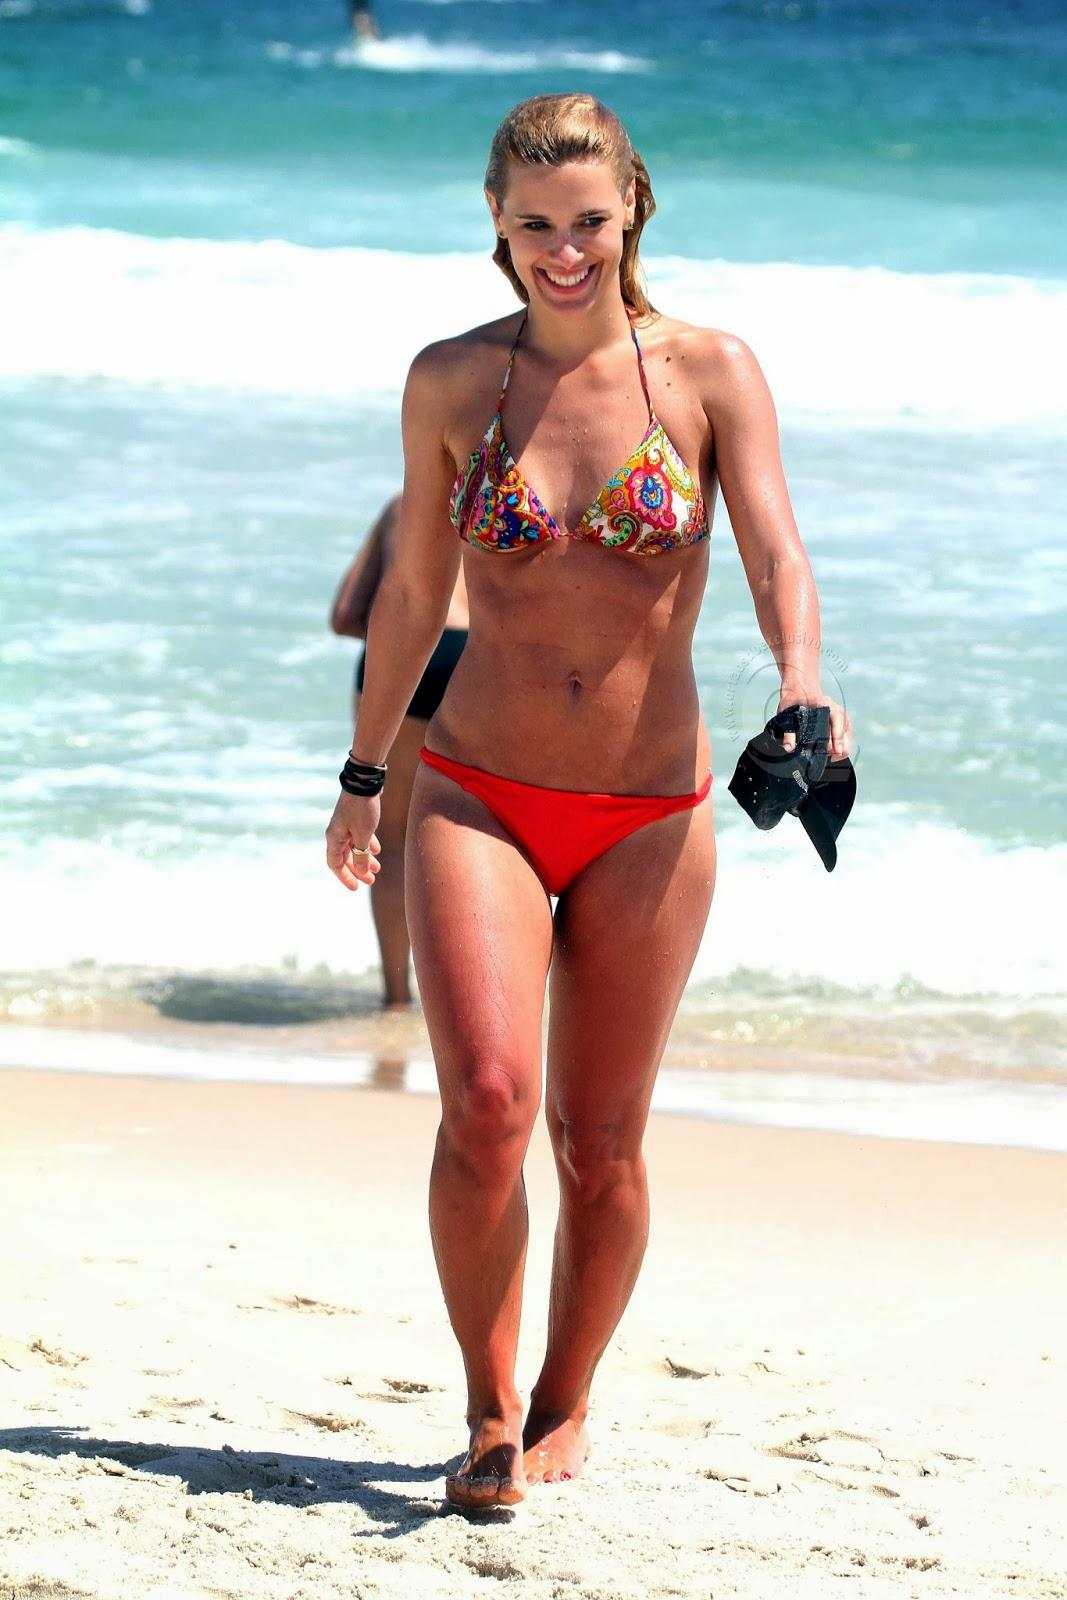 Bikini Carolina Dieckmann nudes (92 photos), Sexy, Paparazzi, Instagram, butt 2006